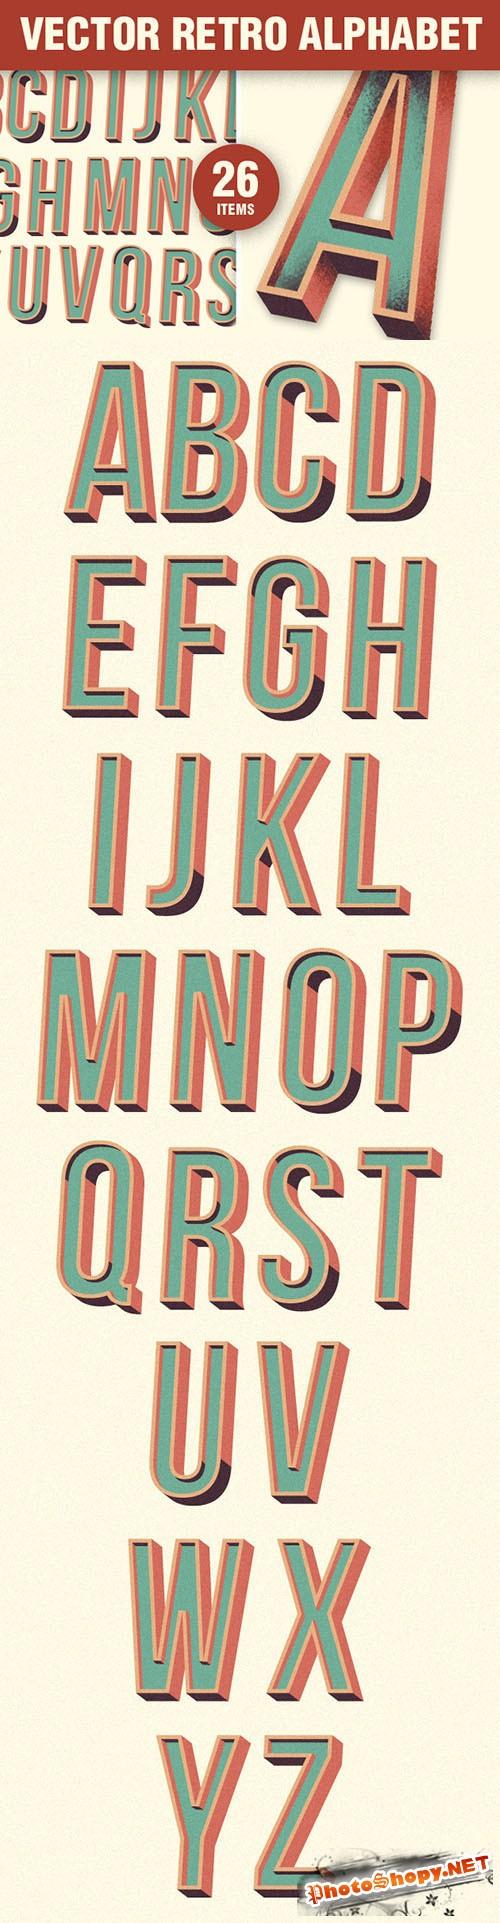 Designtnt - Flat Retro Alphabet